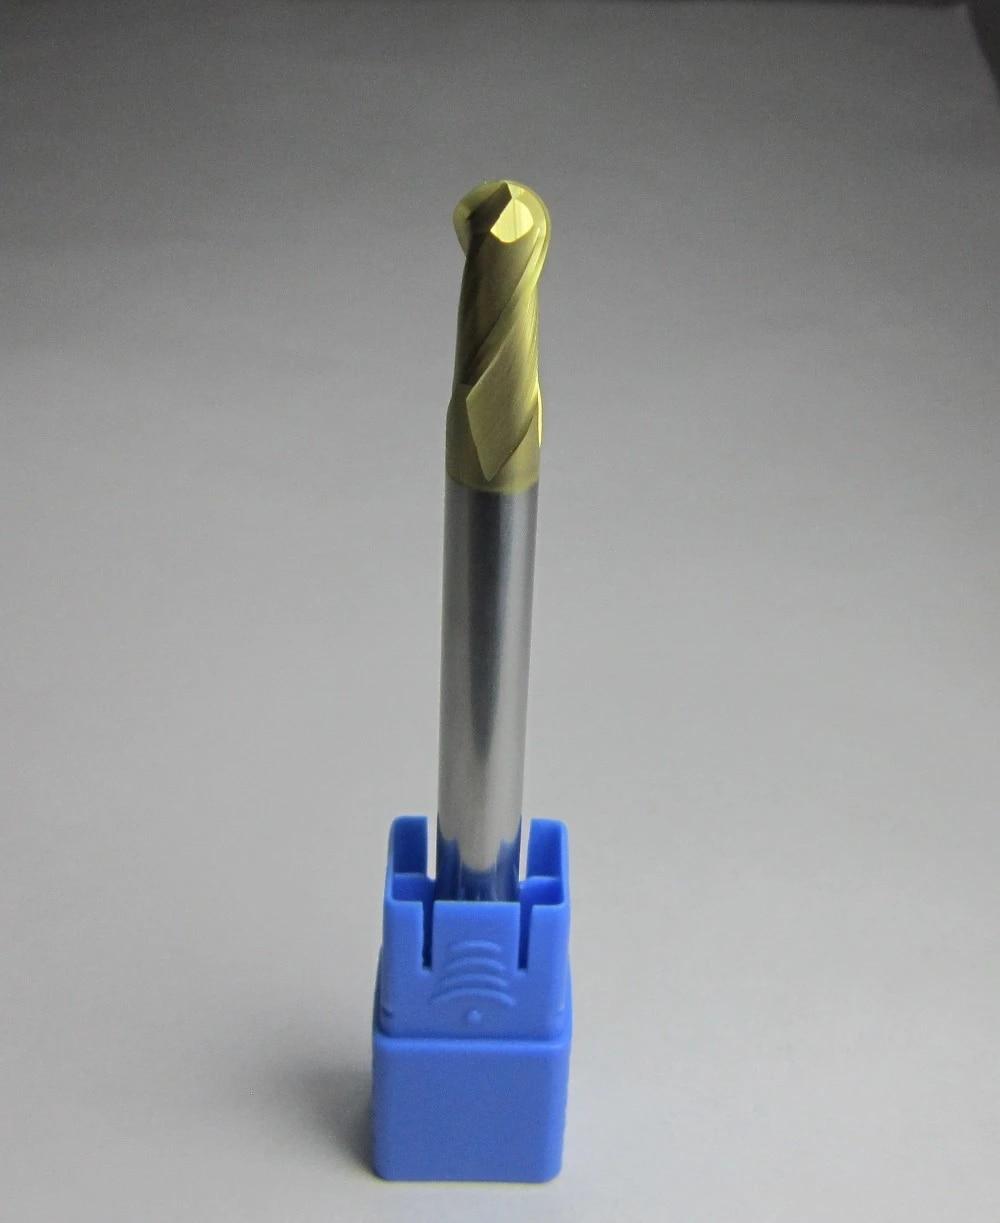 Ø 1mm R0.5 HRC58 Carbide Ball Nose End Mills machine milling cutter finishing